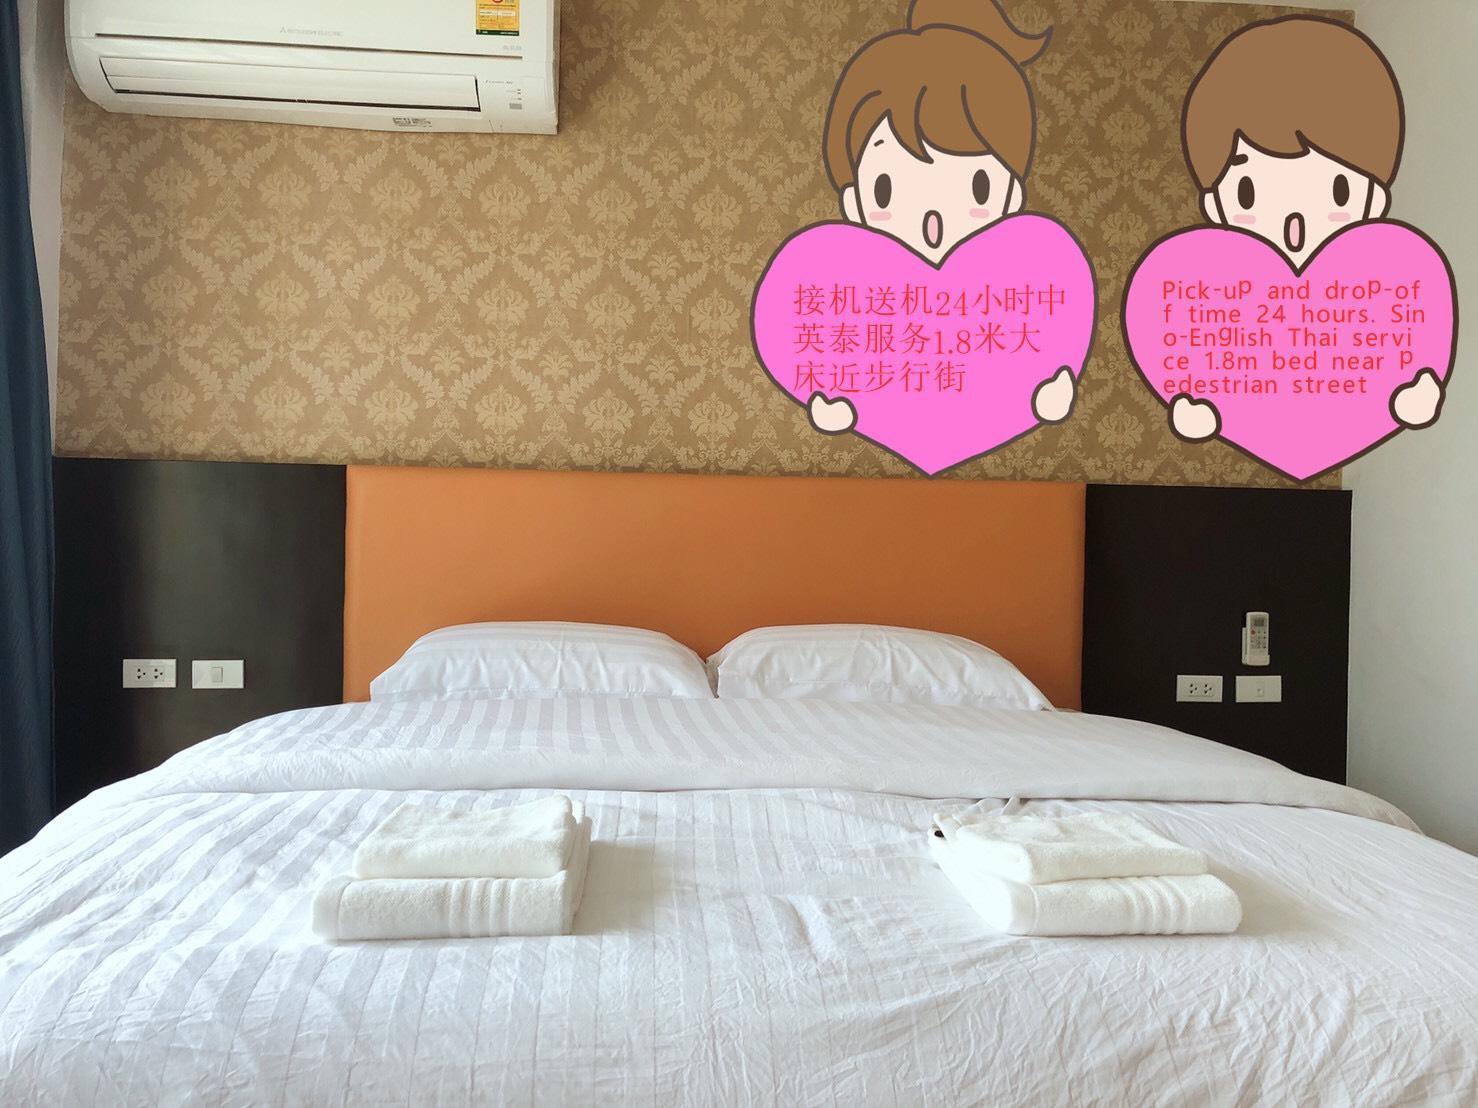 [HW]1.8m Double Room 36m2 Large Room 3 อพาร์ตเมนต์ 1 ห้องนอน 1 ห้องน้ำส่วนตัว ขนาด 36 ตร.ม. – พัทยากลาง